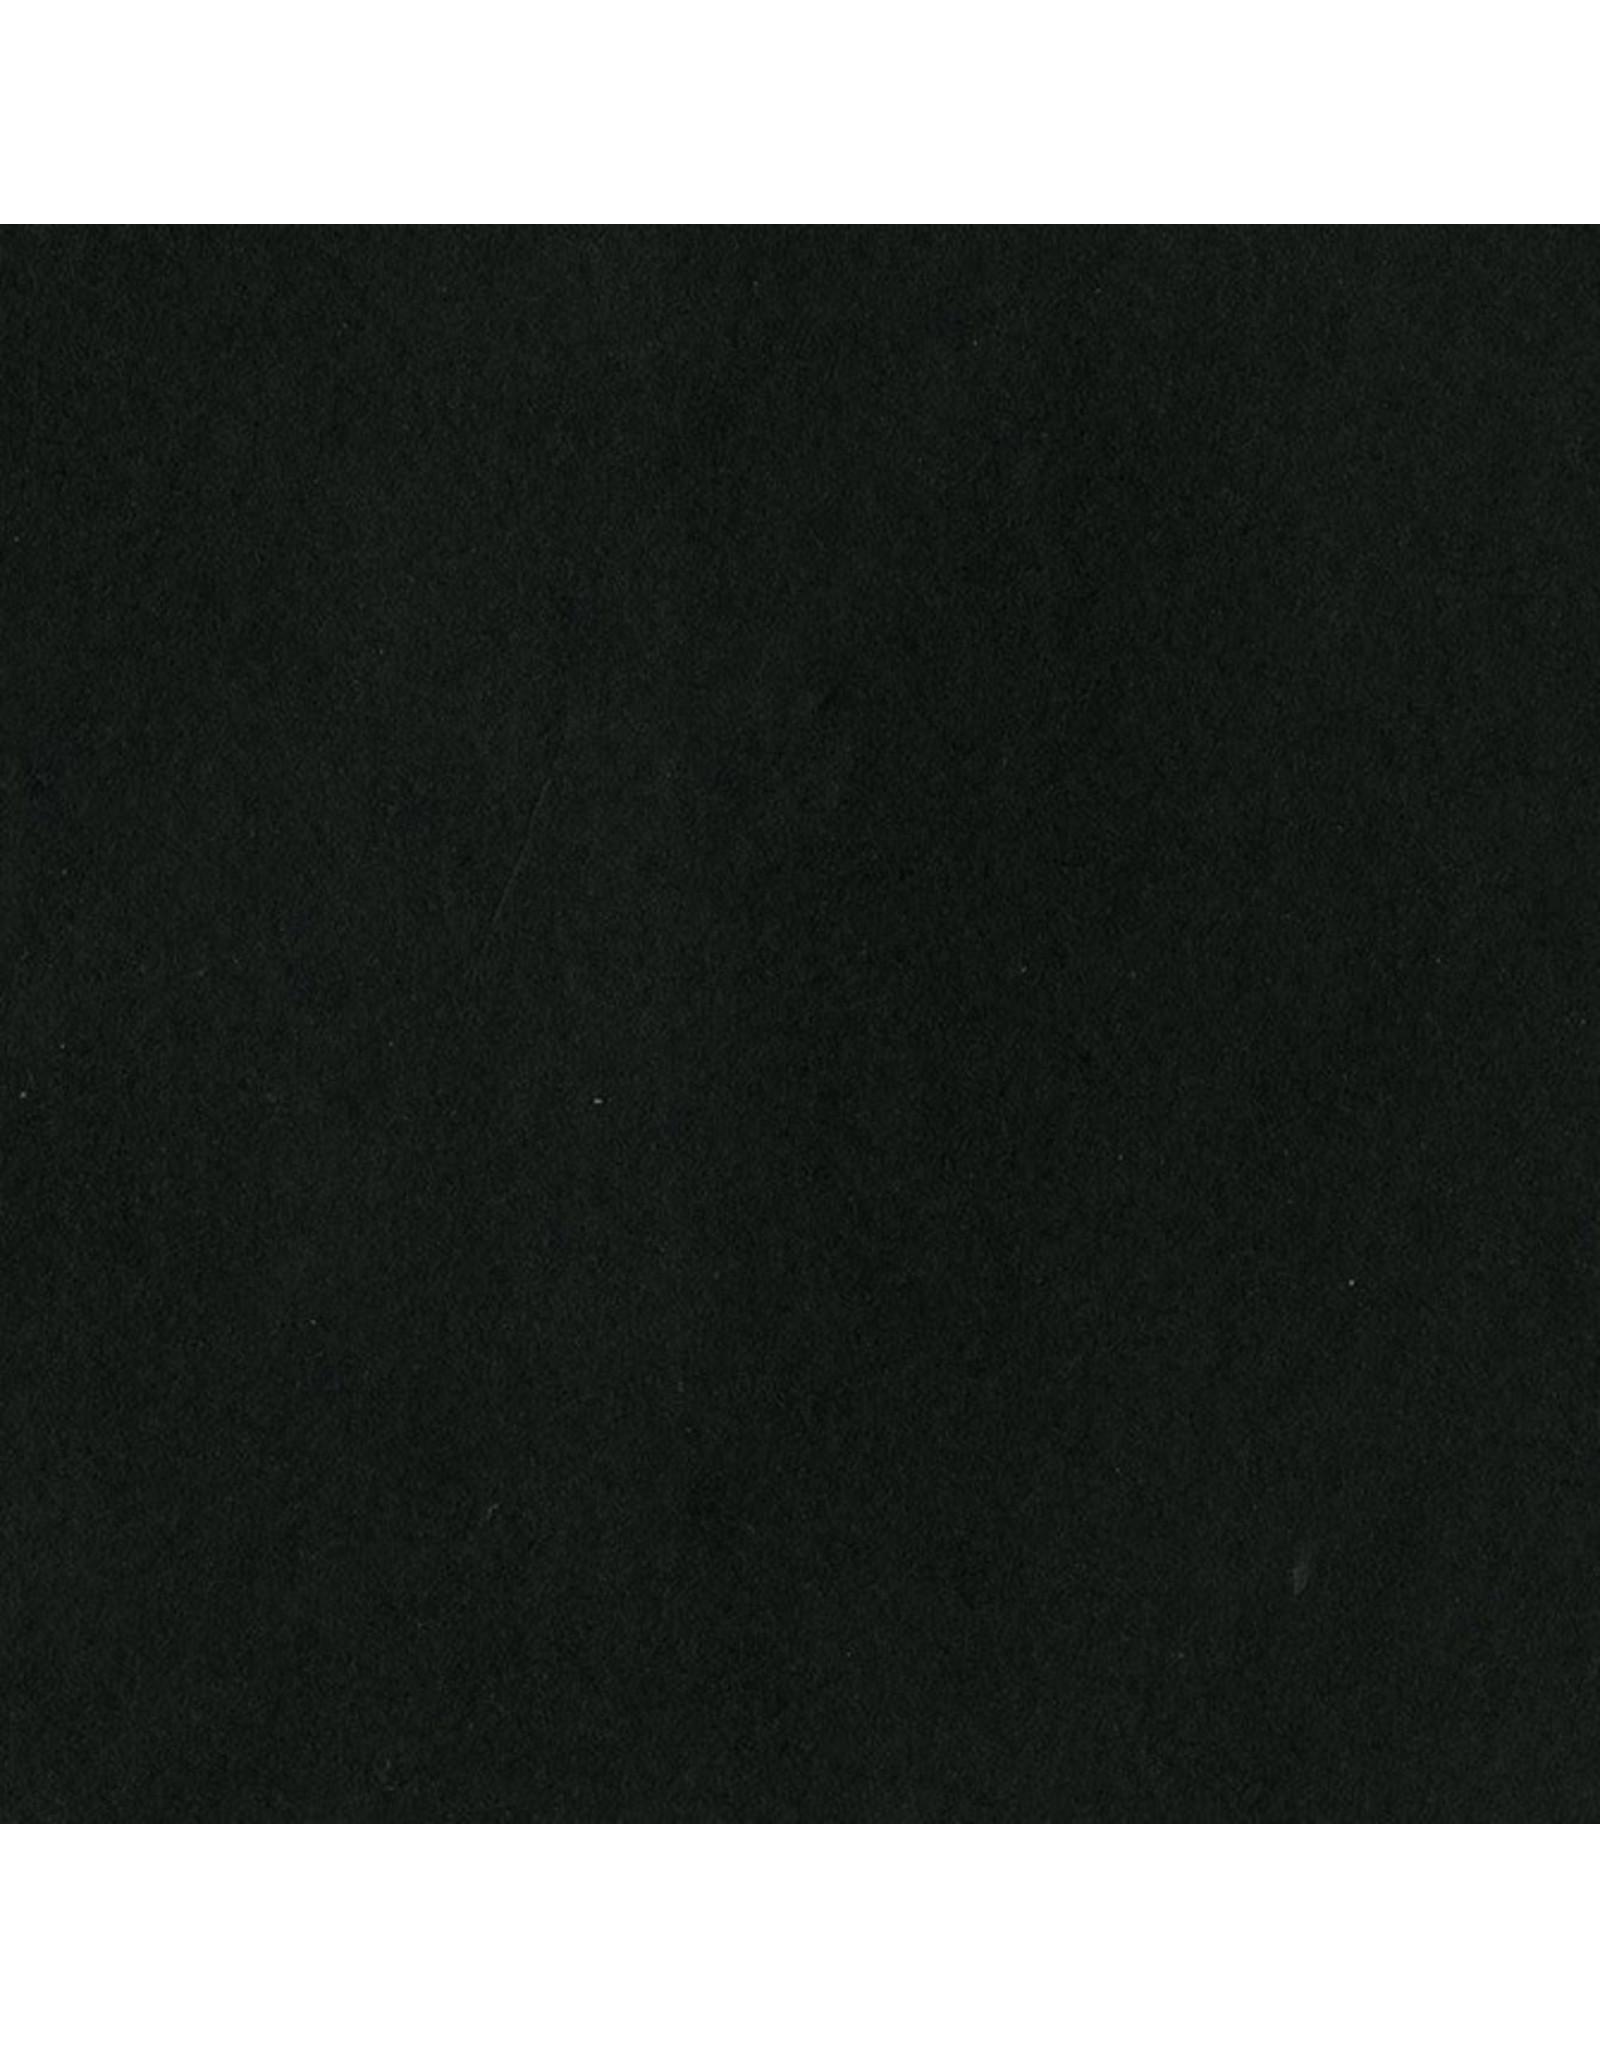 Bazzill Bazzill Card Shoppe 8.5x11 - Licorice Twist